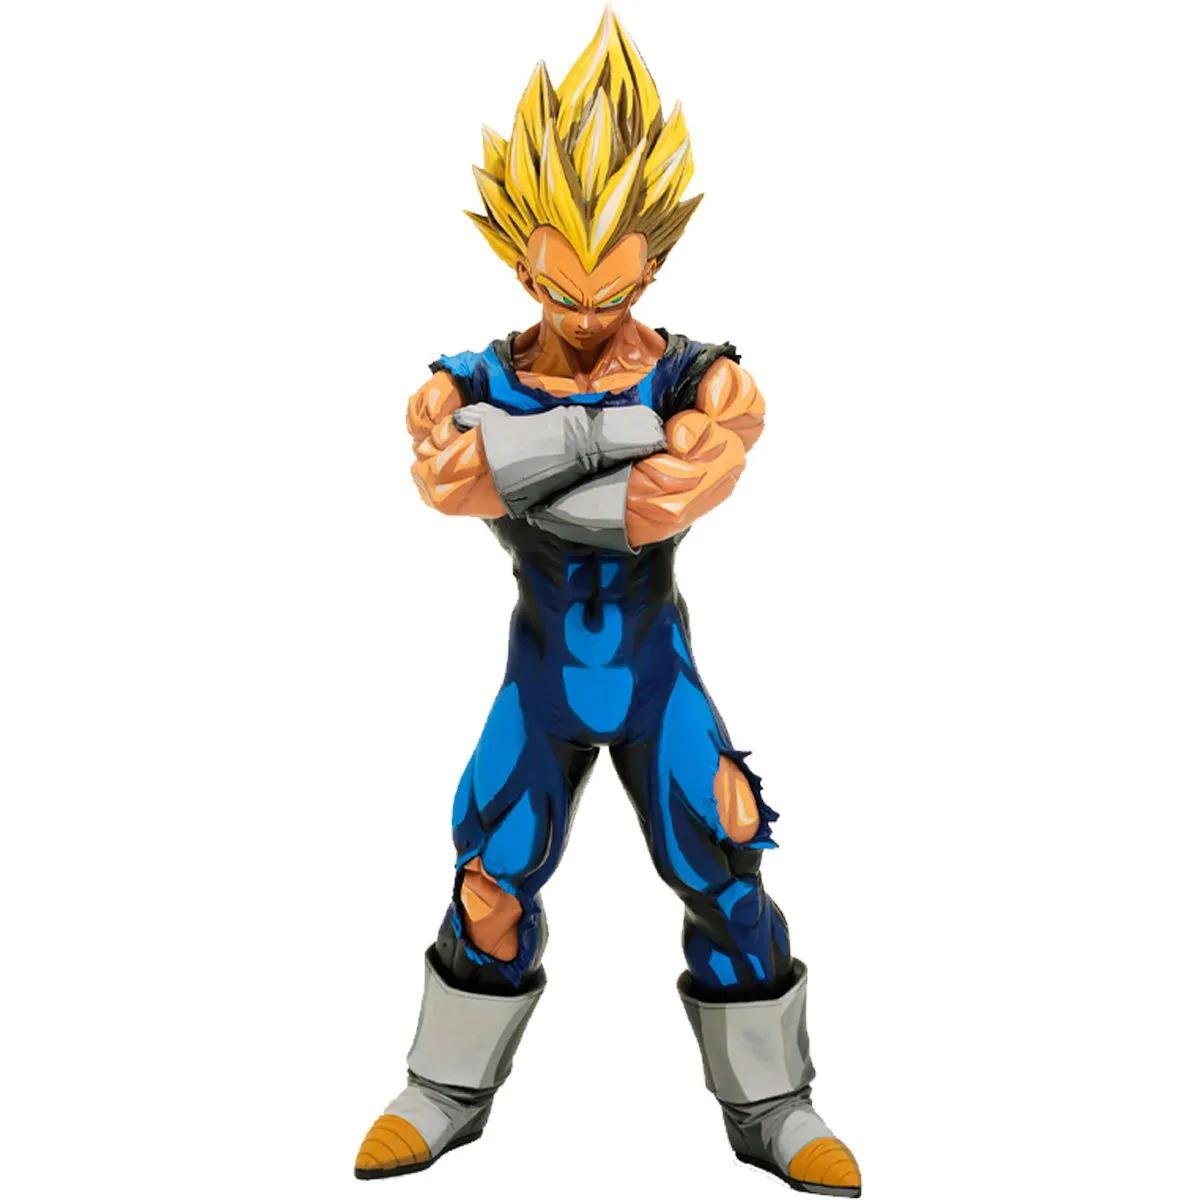 Dragon Ball Z - Vegeta Super Saiyajin - Grandista Manga Dimensions - Bandai Banpresto